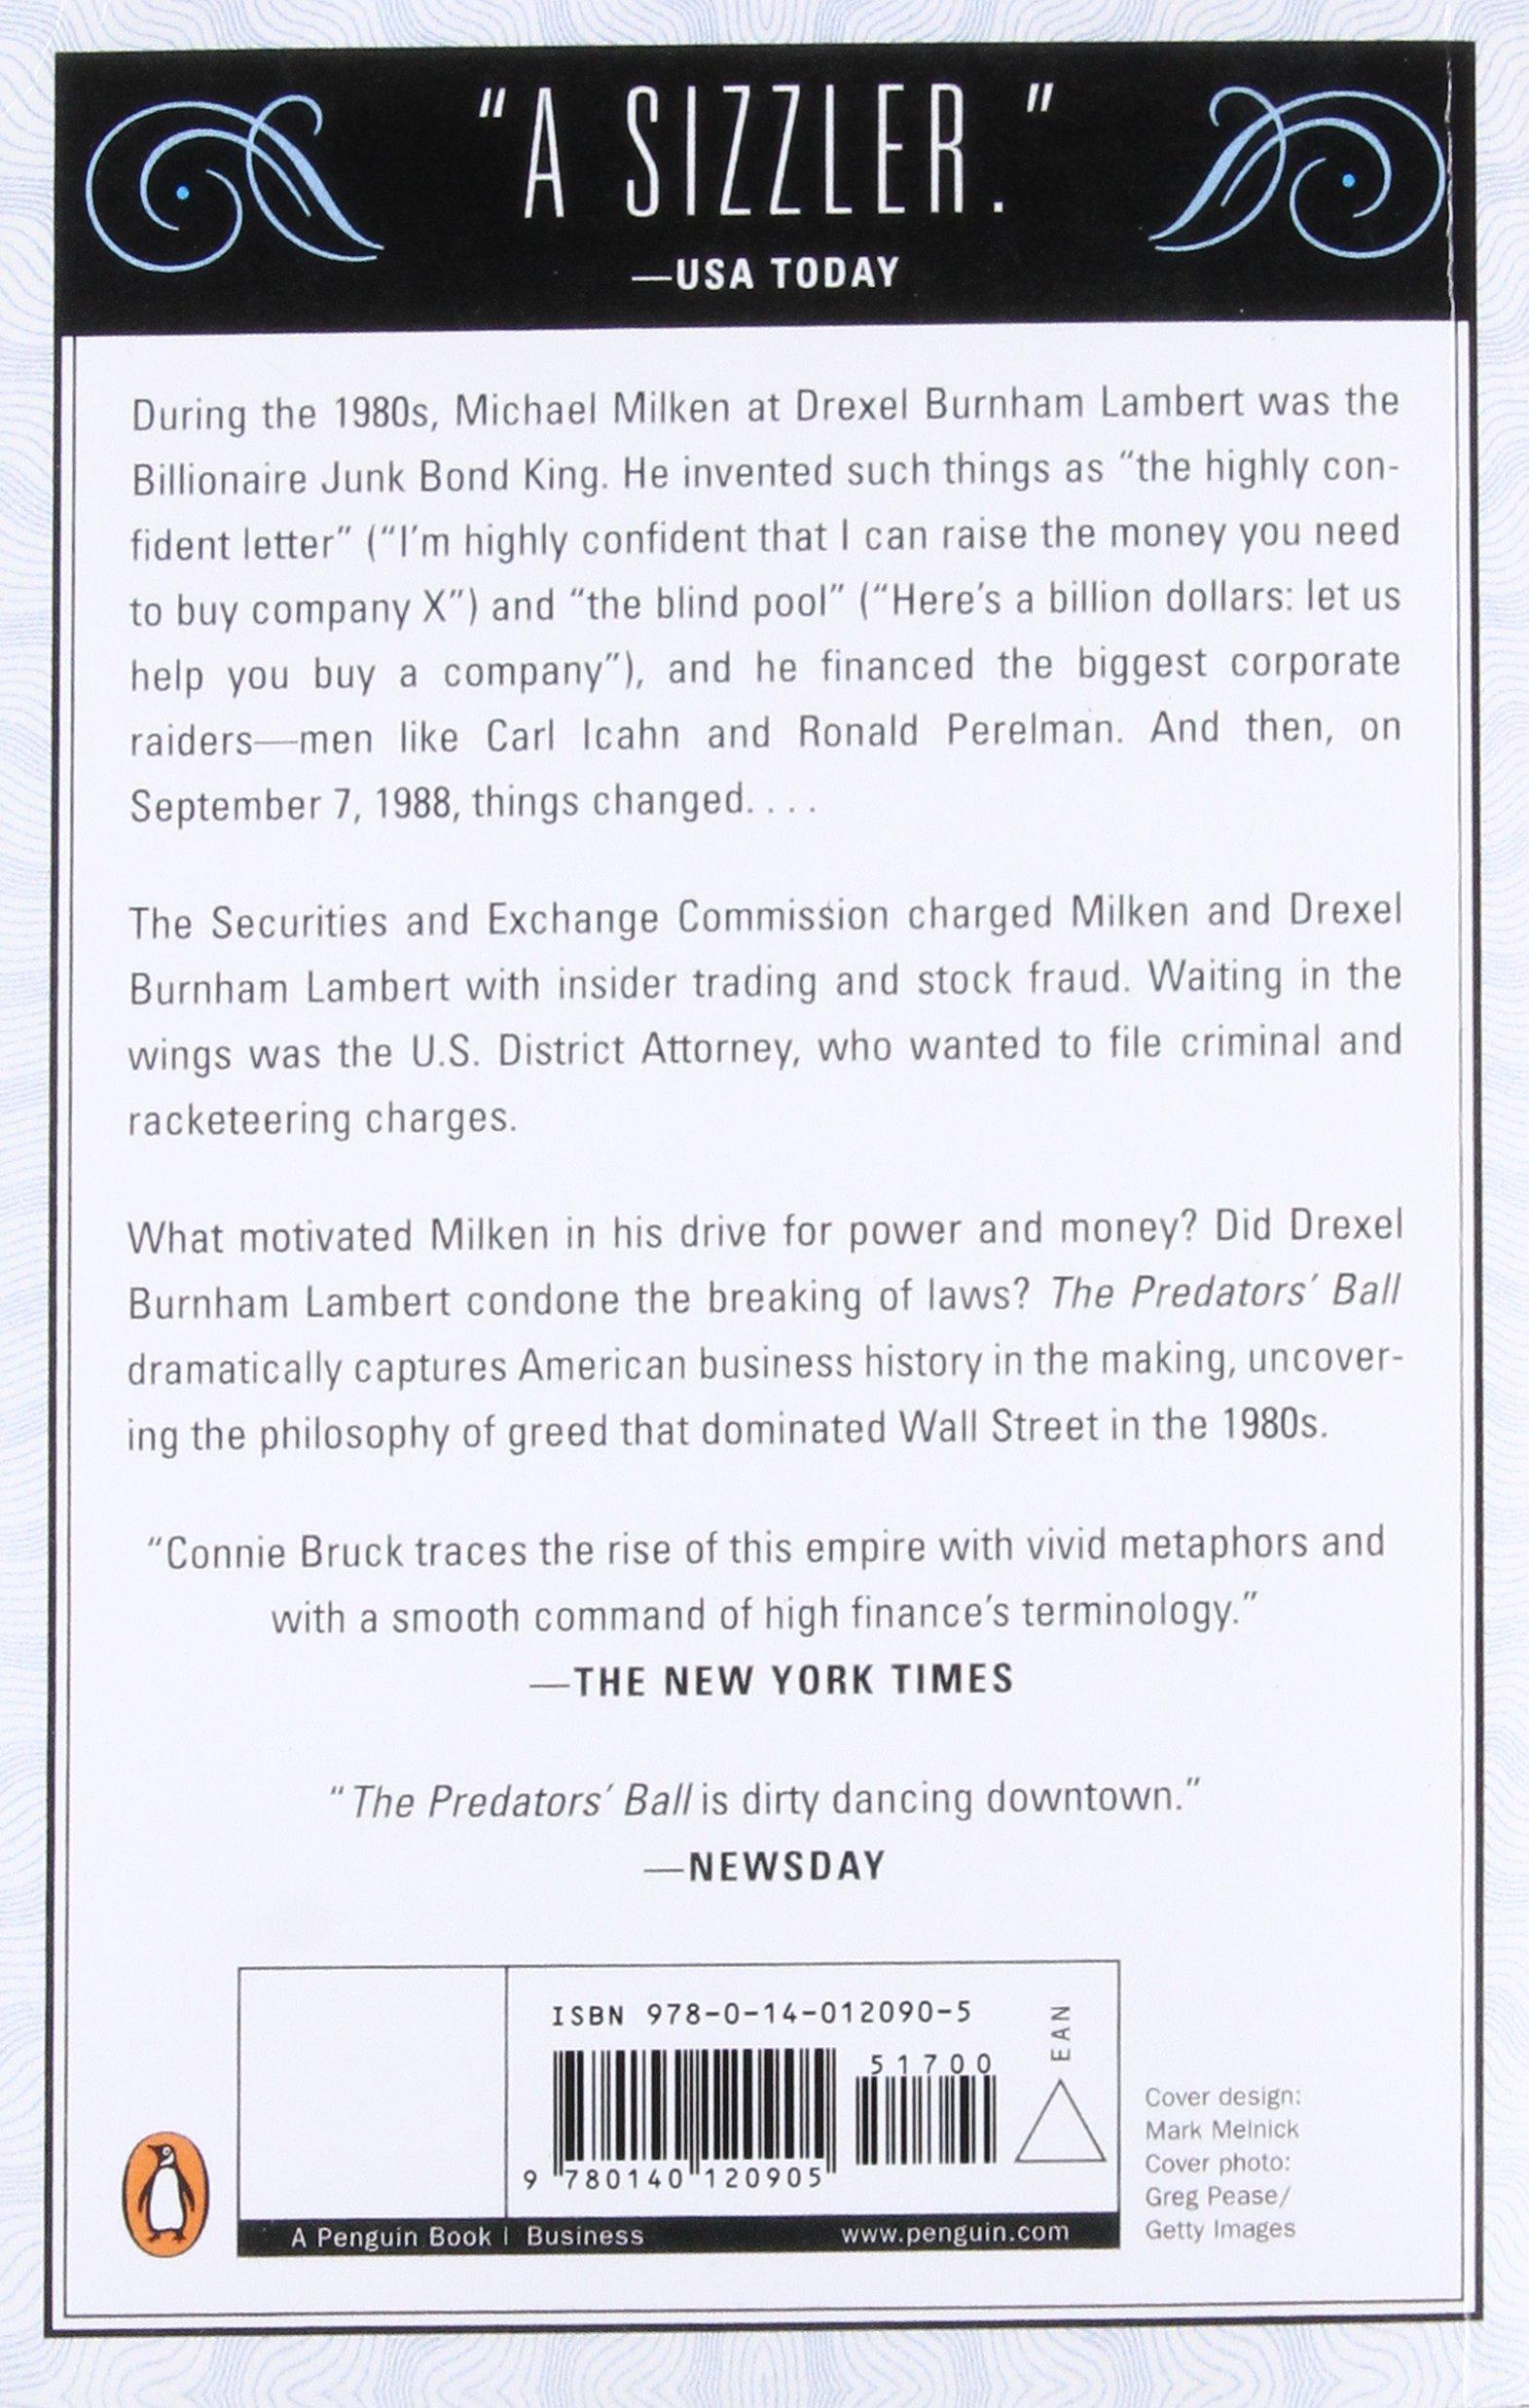 Designer deals club for hancock - The Predators Ball The Inside Story Of Drexel Burnham And The Rise Of The Junkbond Raiders Connie Bruck 8601420200944 Amazon Com Books